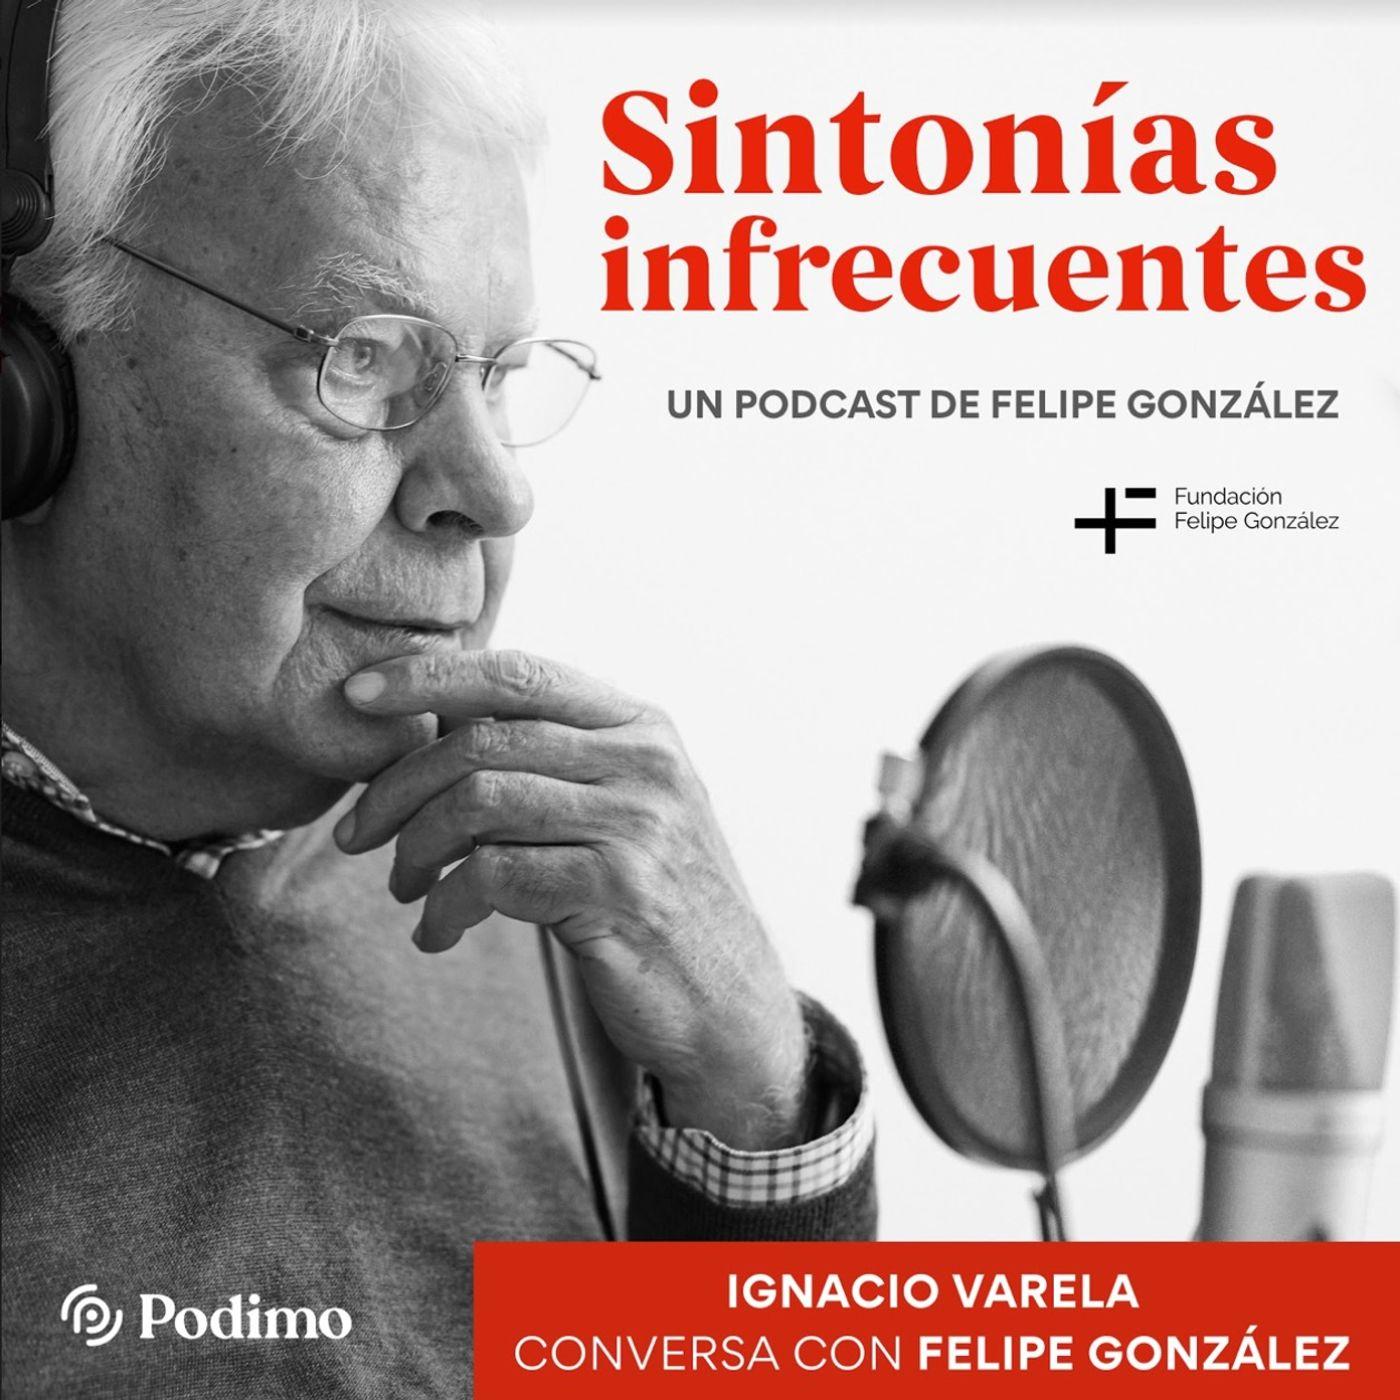 Avance episodio 1: Liderazgo vs. Caudillismo. Ignacio Varela conversa con Felipe González.